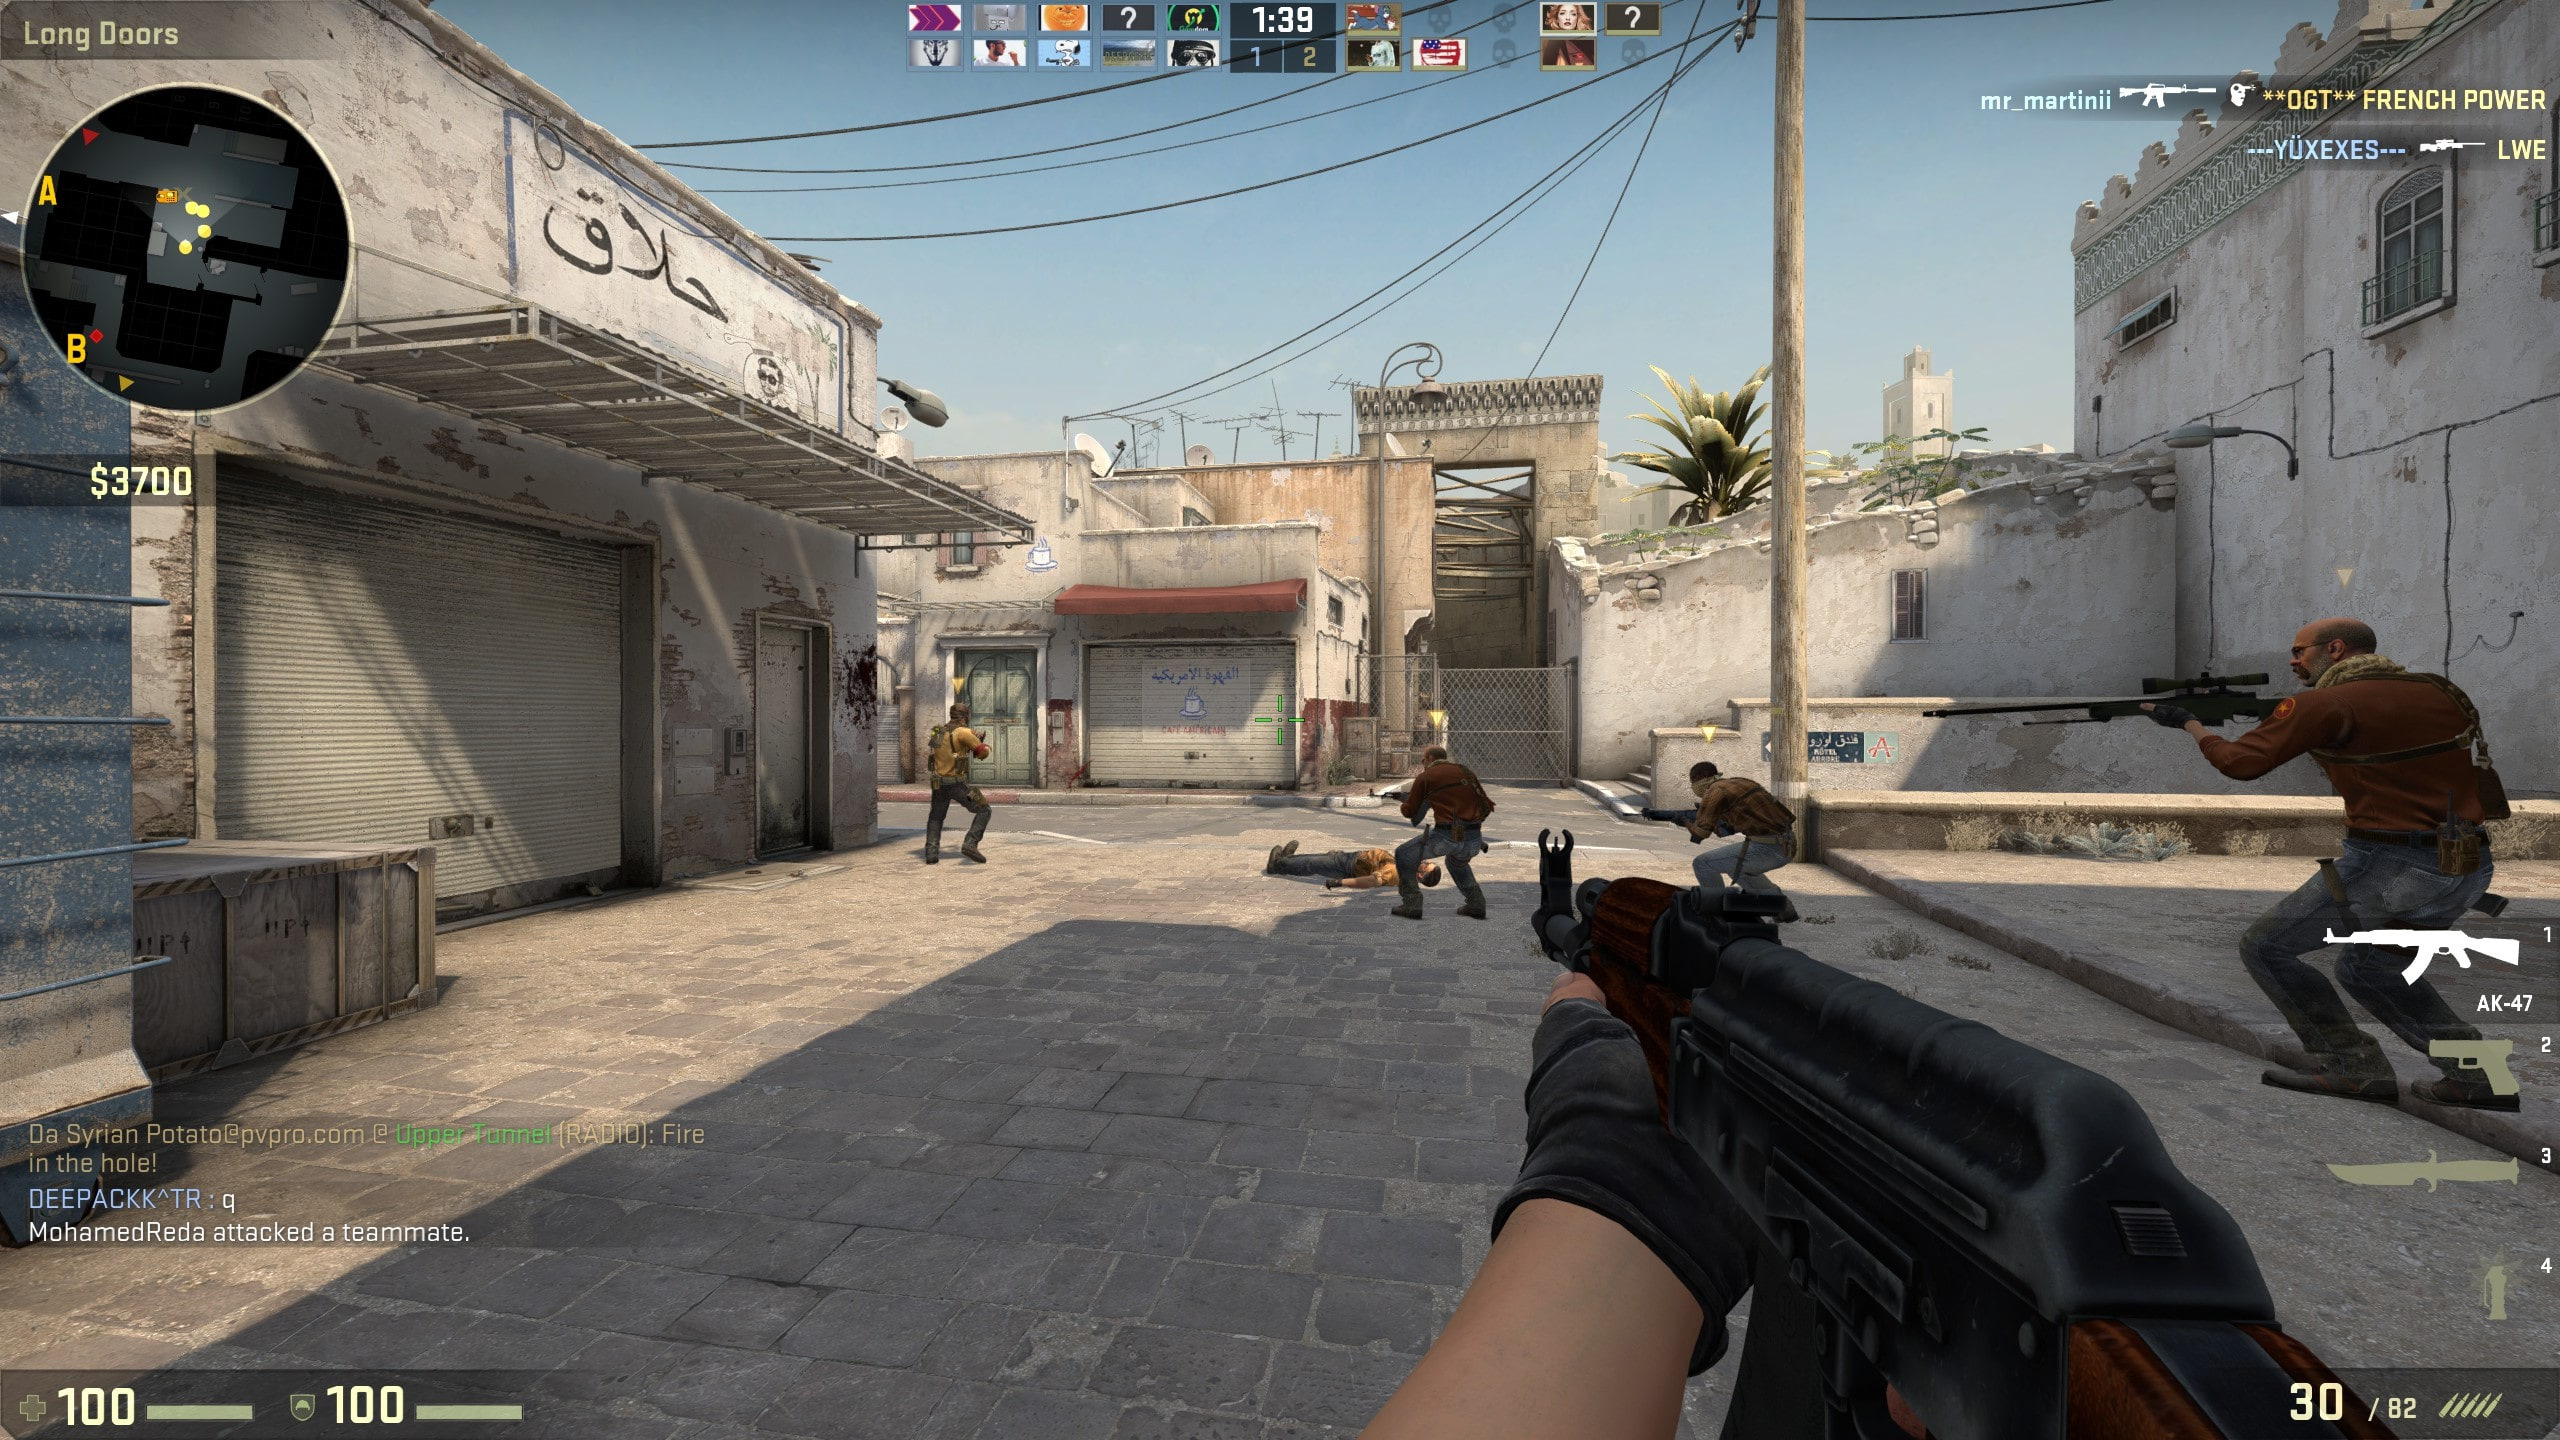 CSGO Screenshot 2